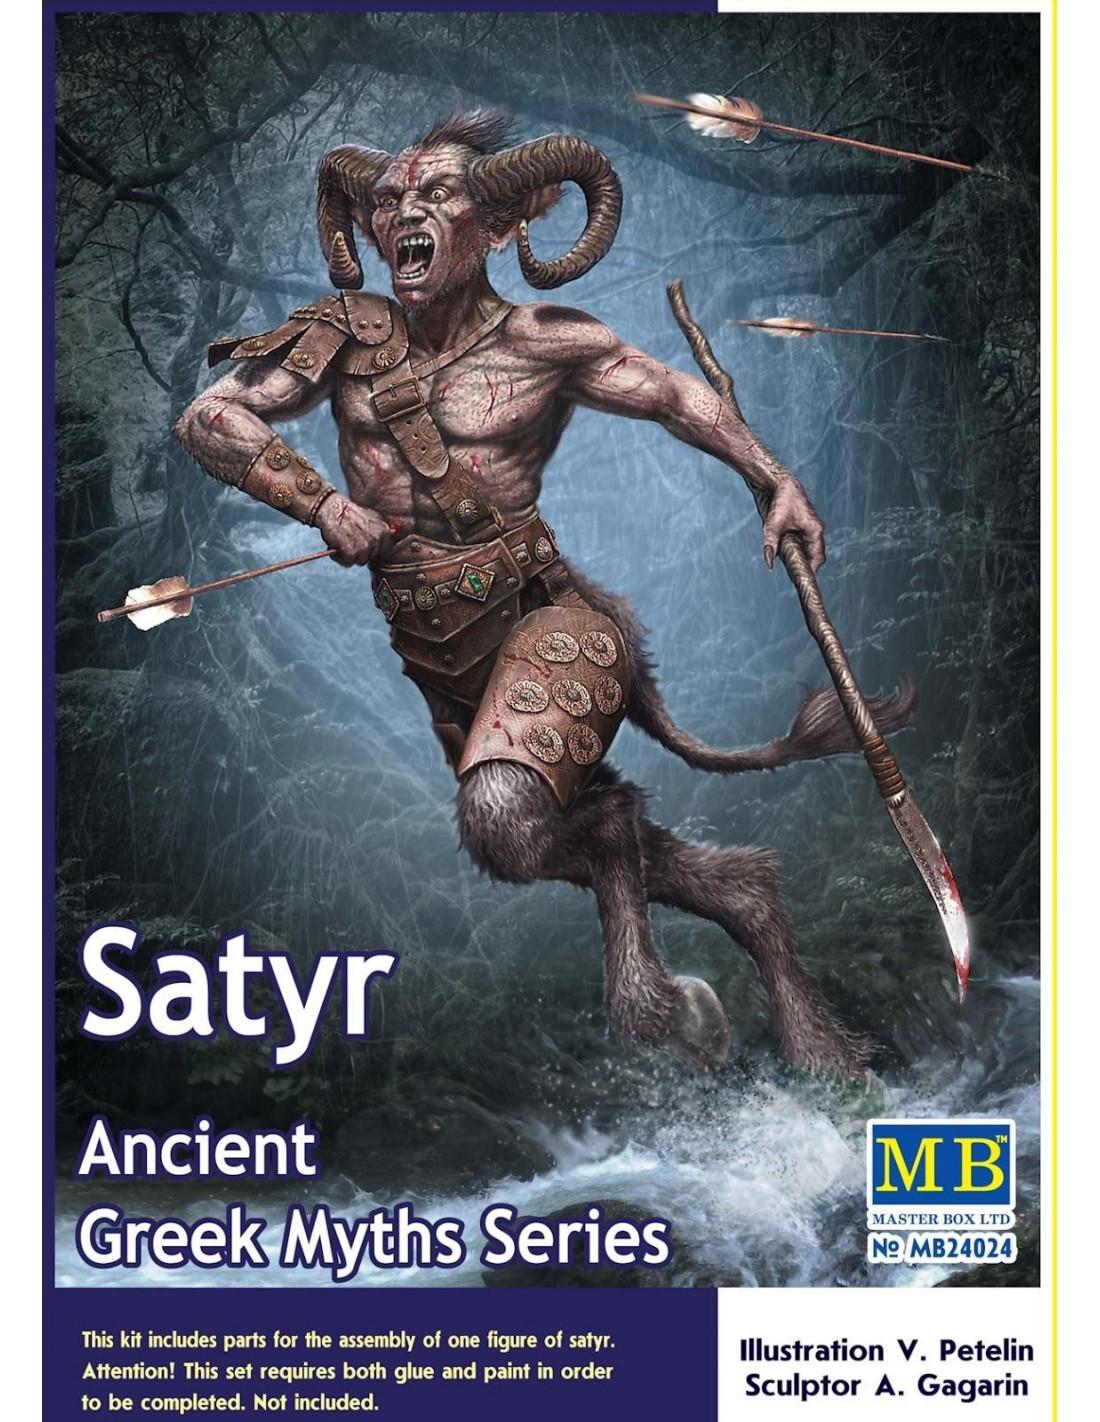 Griechische Mythologie Doku